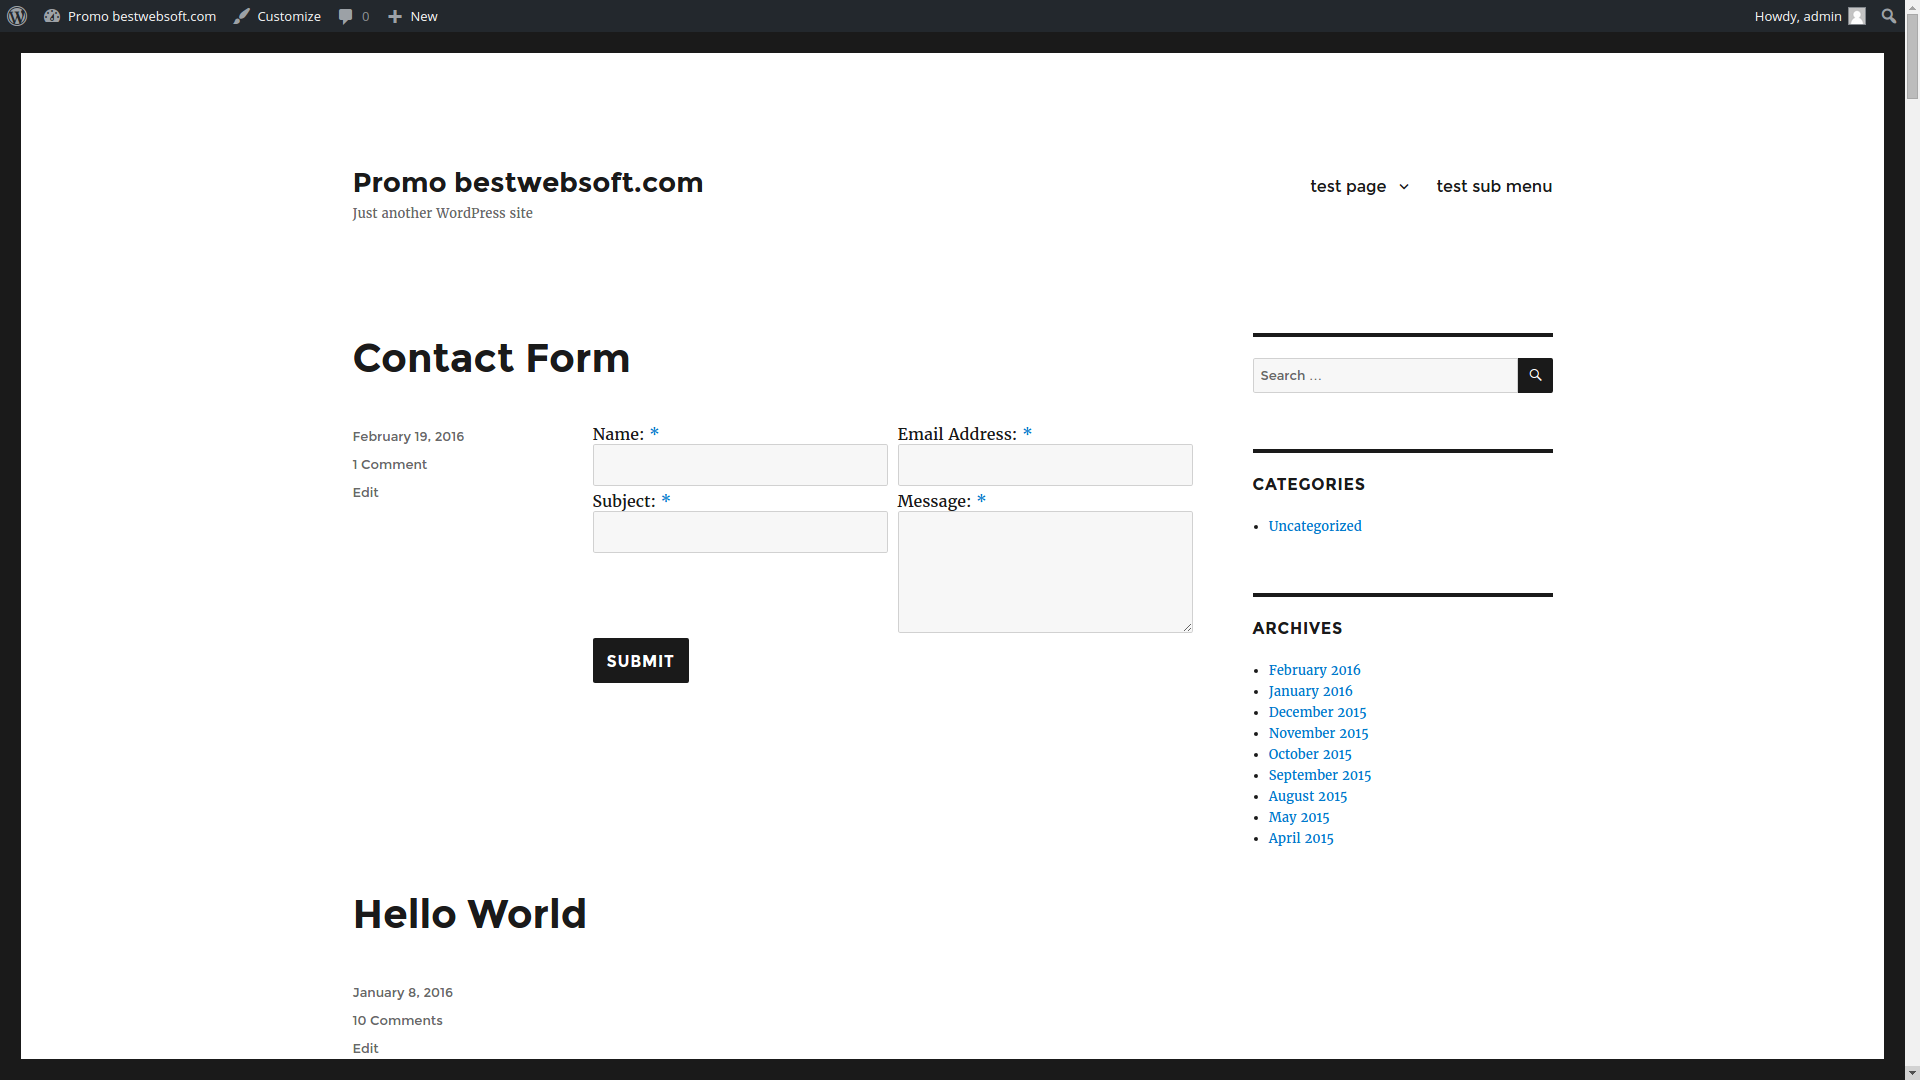 contact form screenshot 3